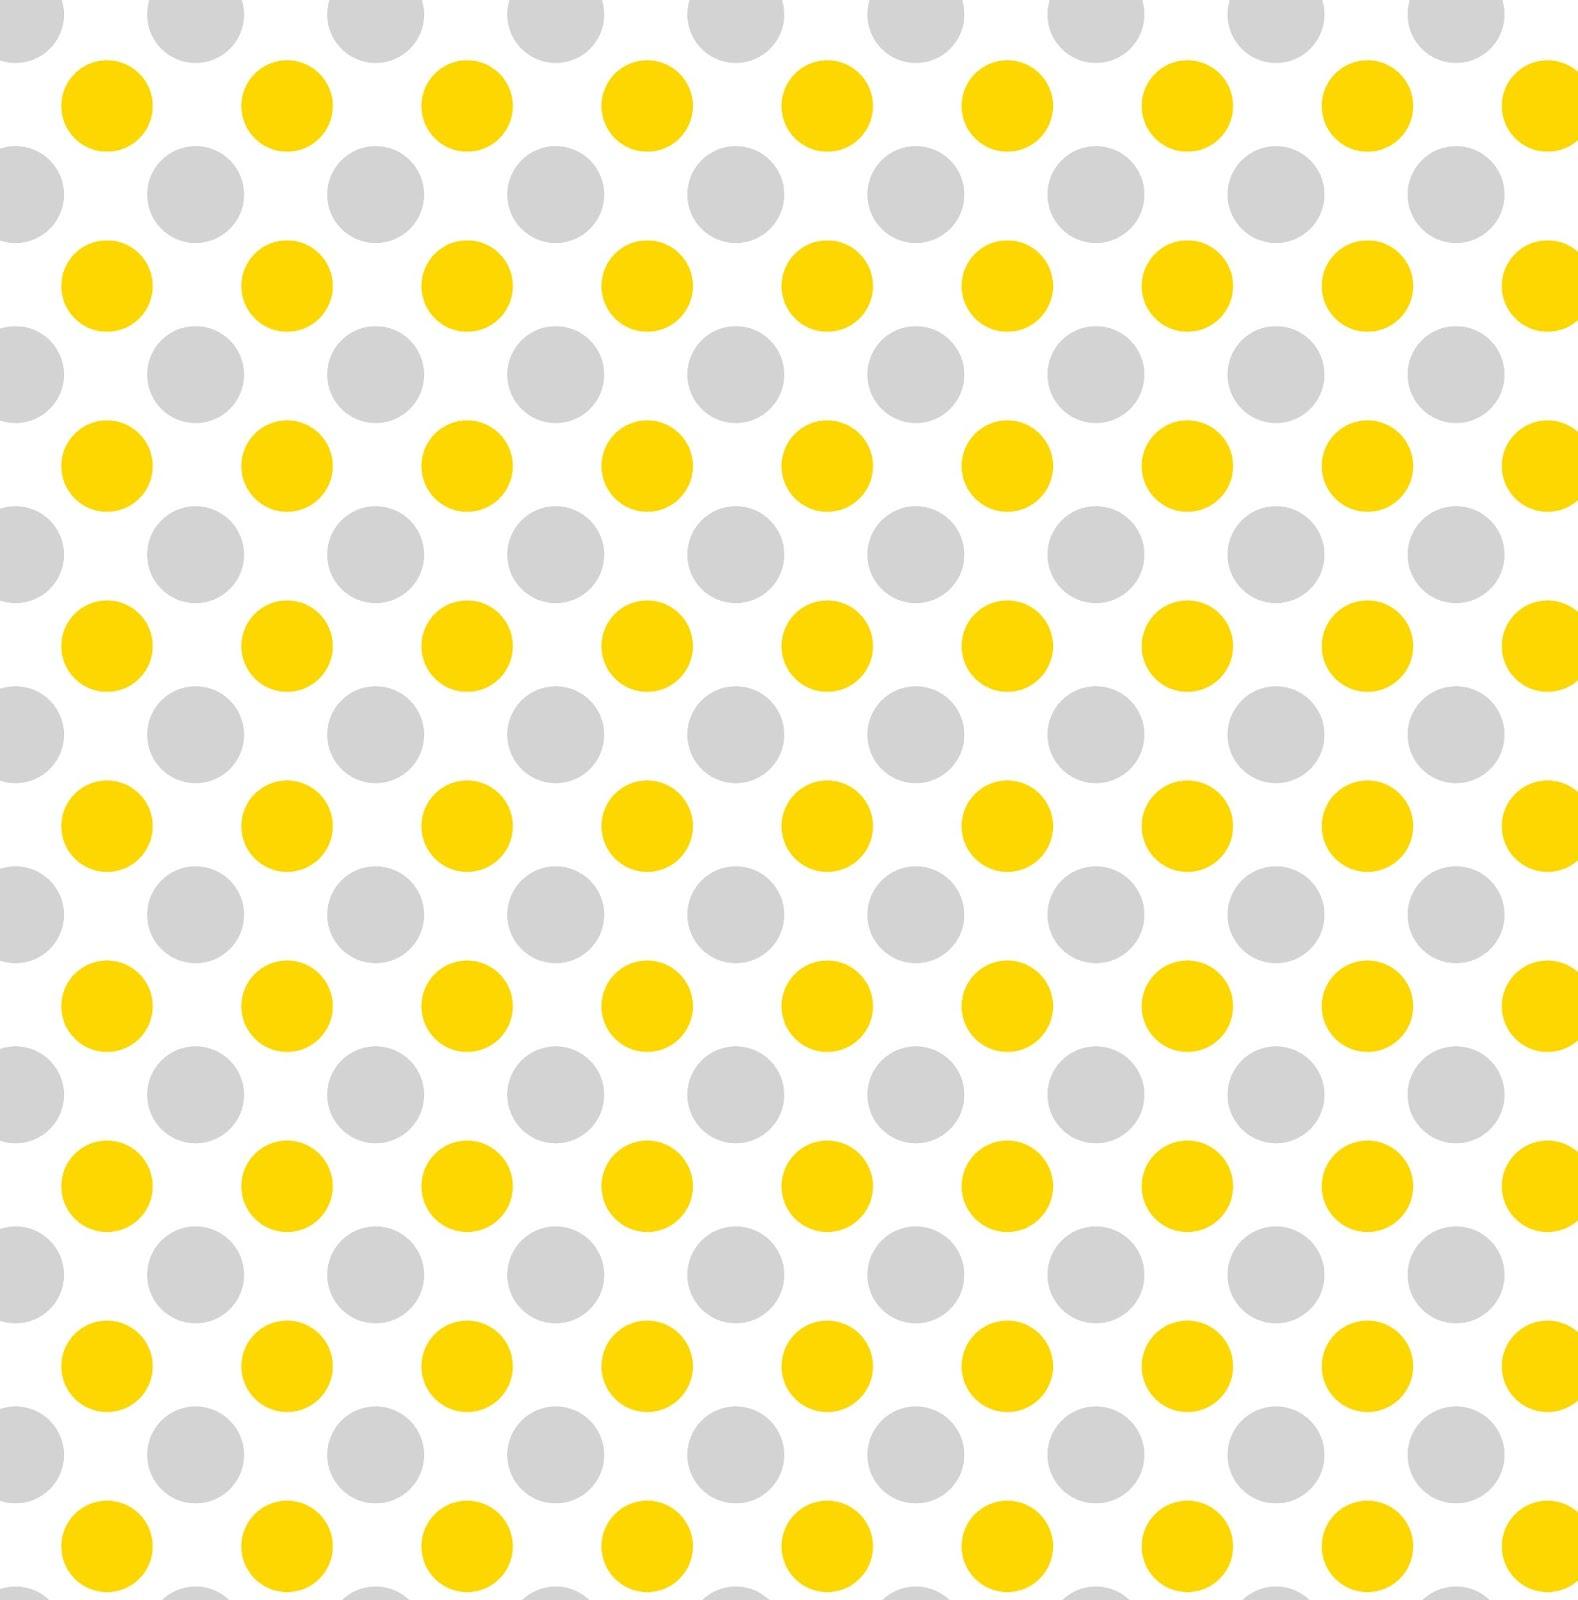 Inkscape TutorialYellow And Gray Polka Dots